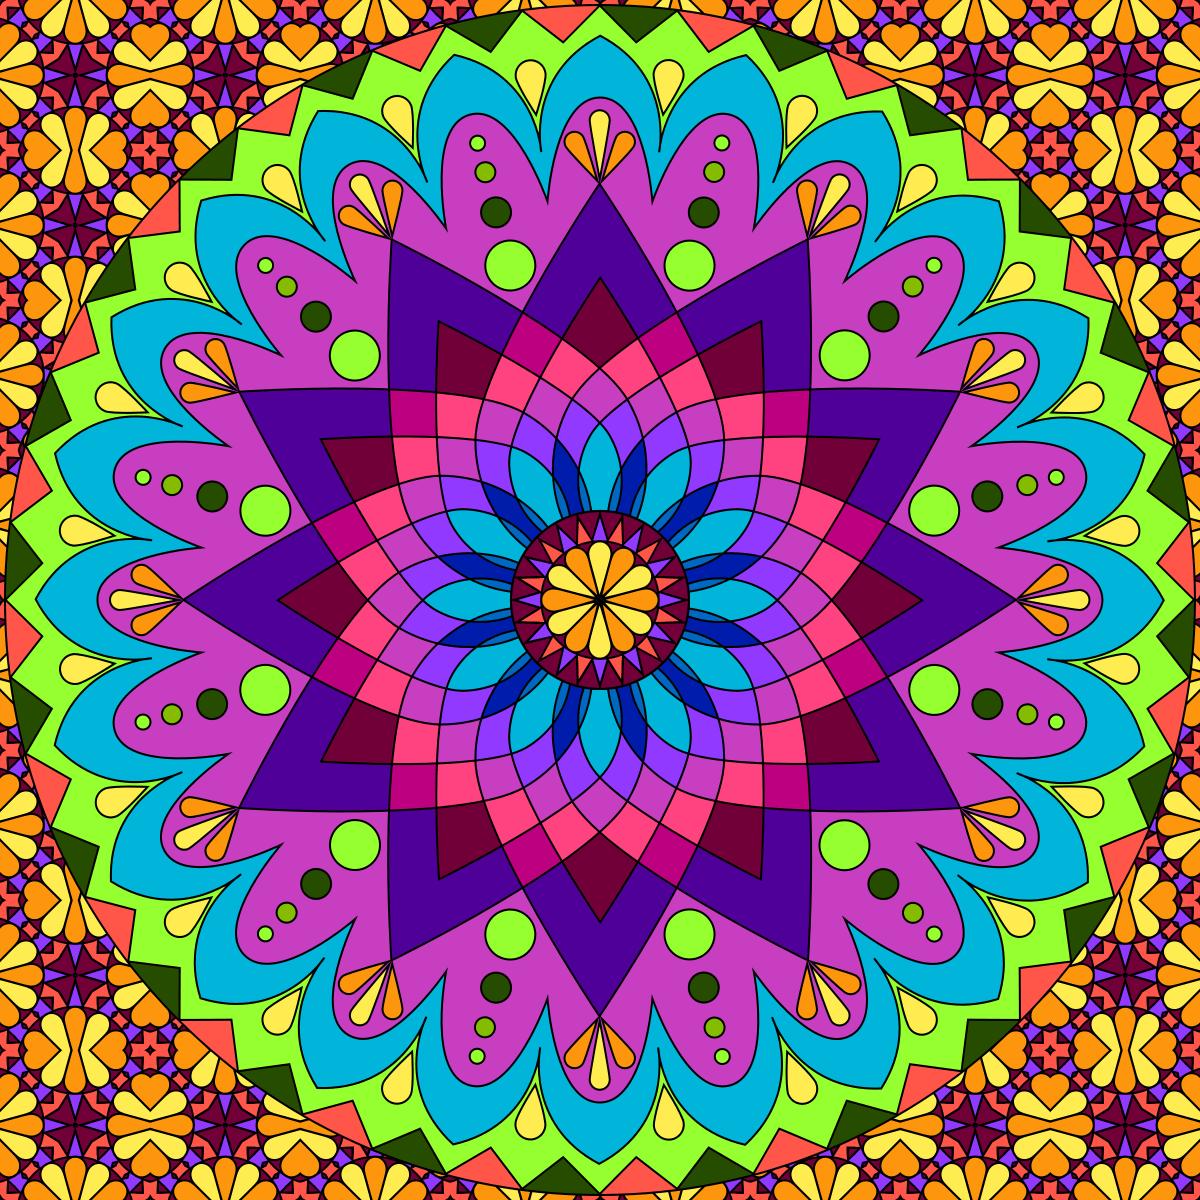 Colorful Mandala Pattern Wallpapers Top Free Colorful Mandala Pattern Backgrounds Wallpaperaccess